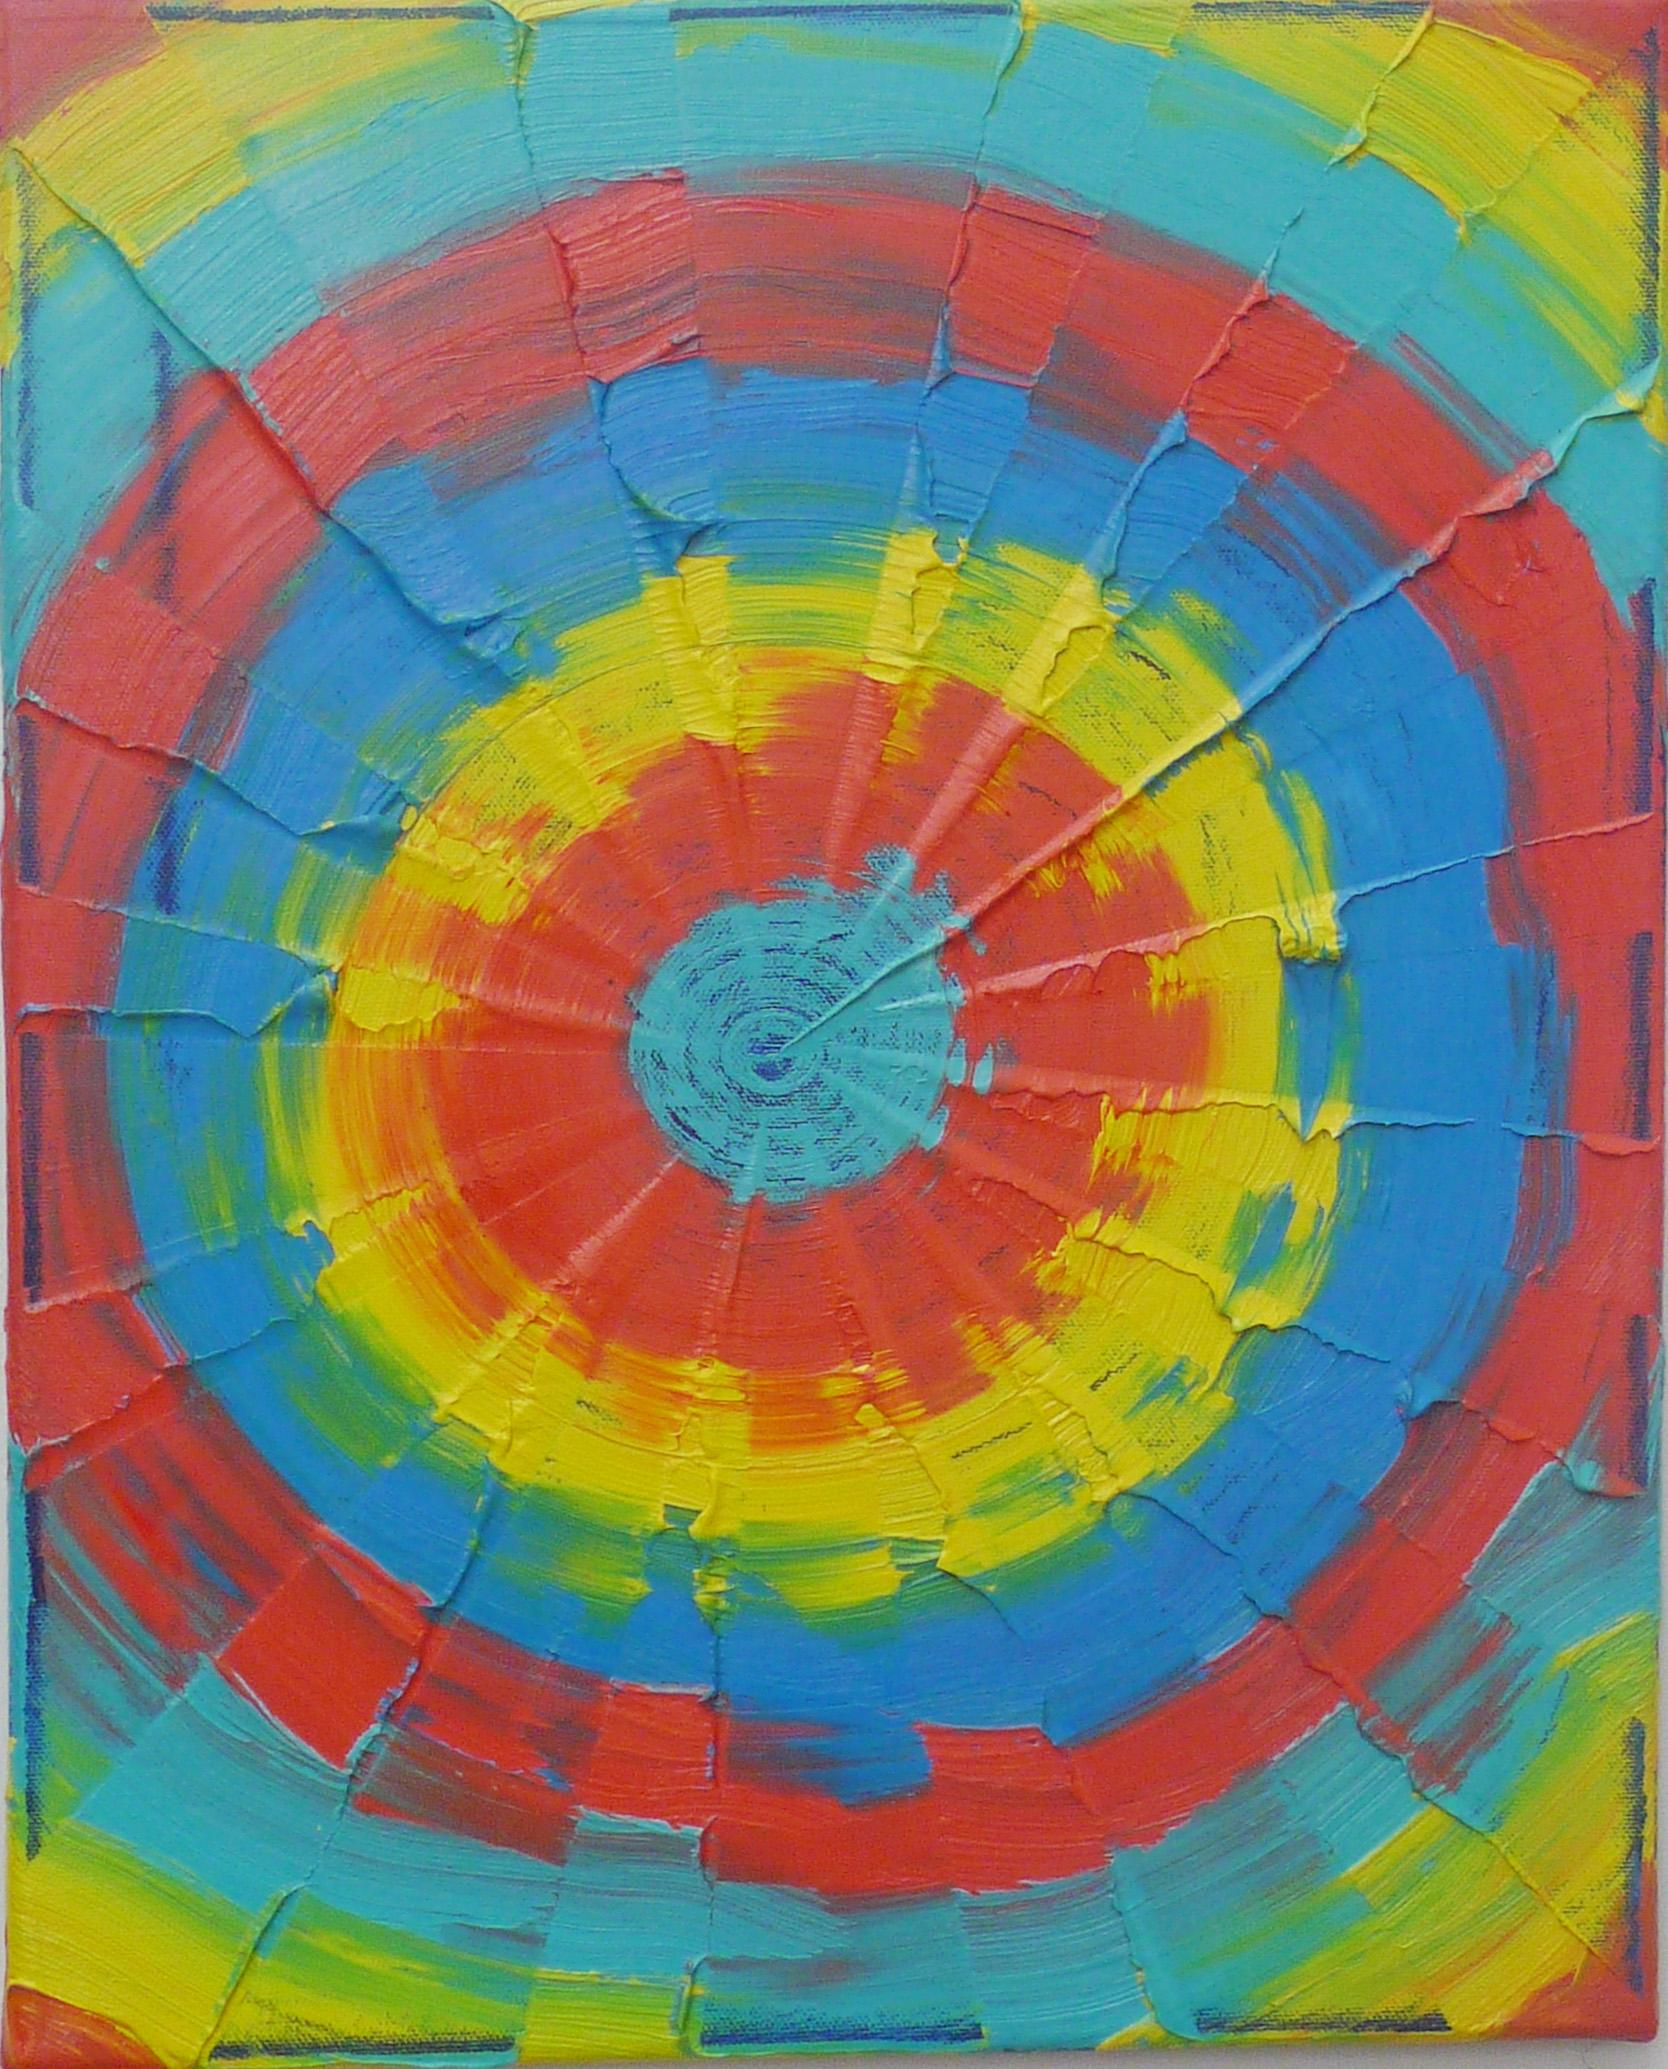 Die  , 2013   Oil on canvas, 51x40.5 cm cm